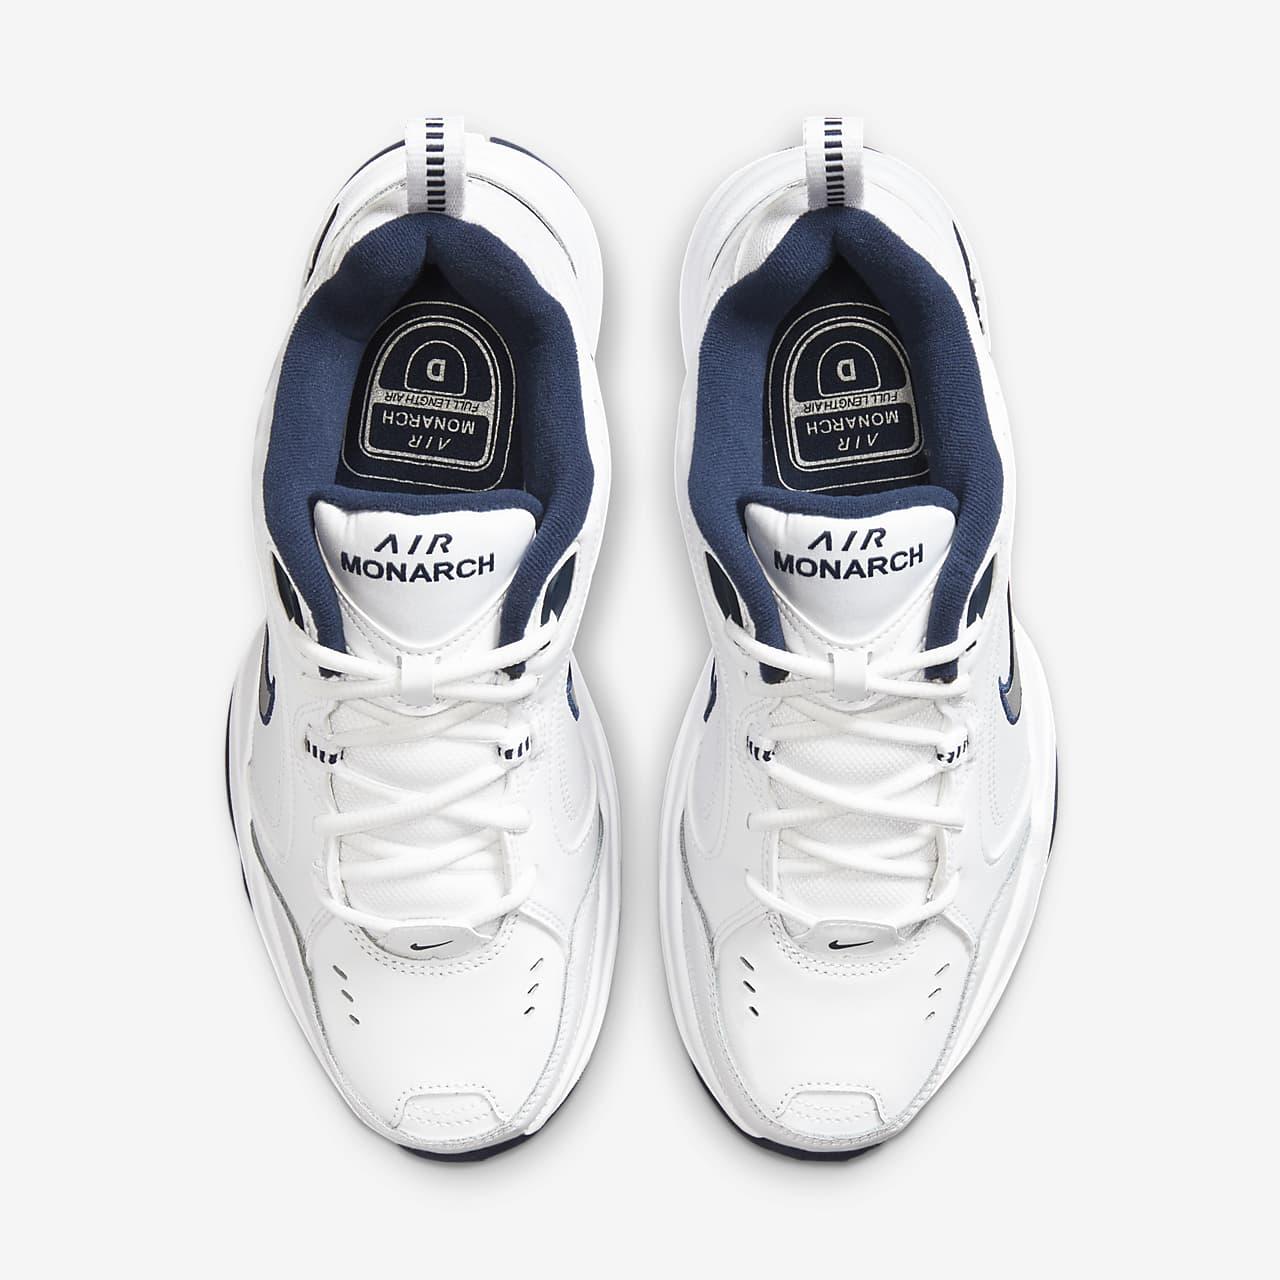 4dddaedb96c2 Nike Air Monarch IV utcai/edzőtermi cipő. Nike.com HU